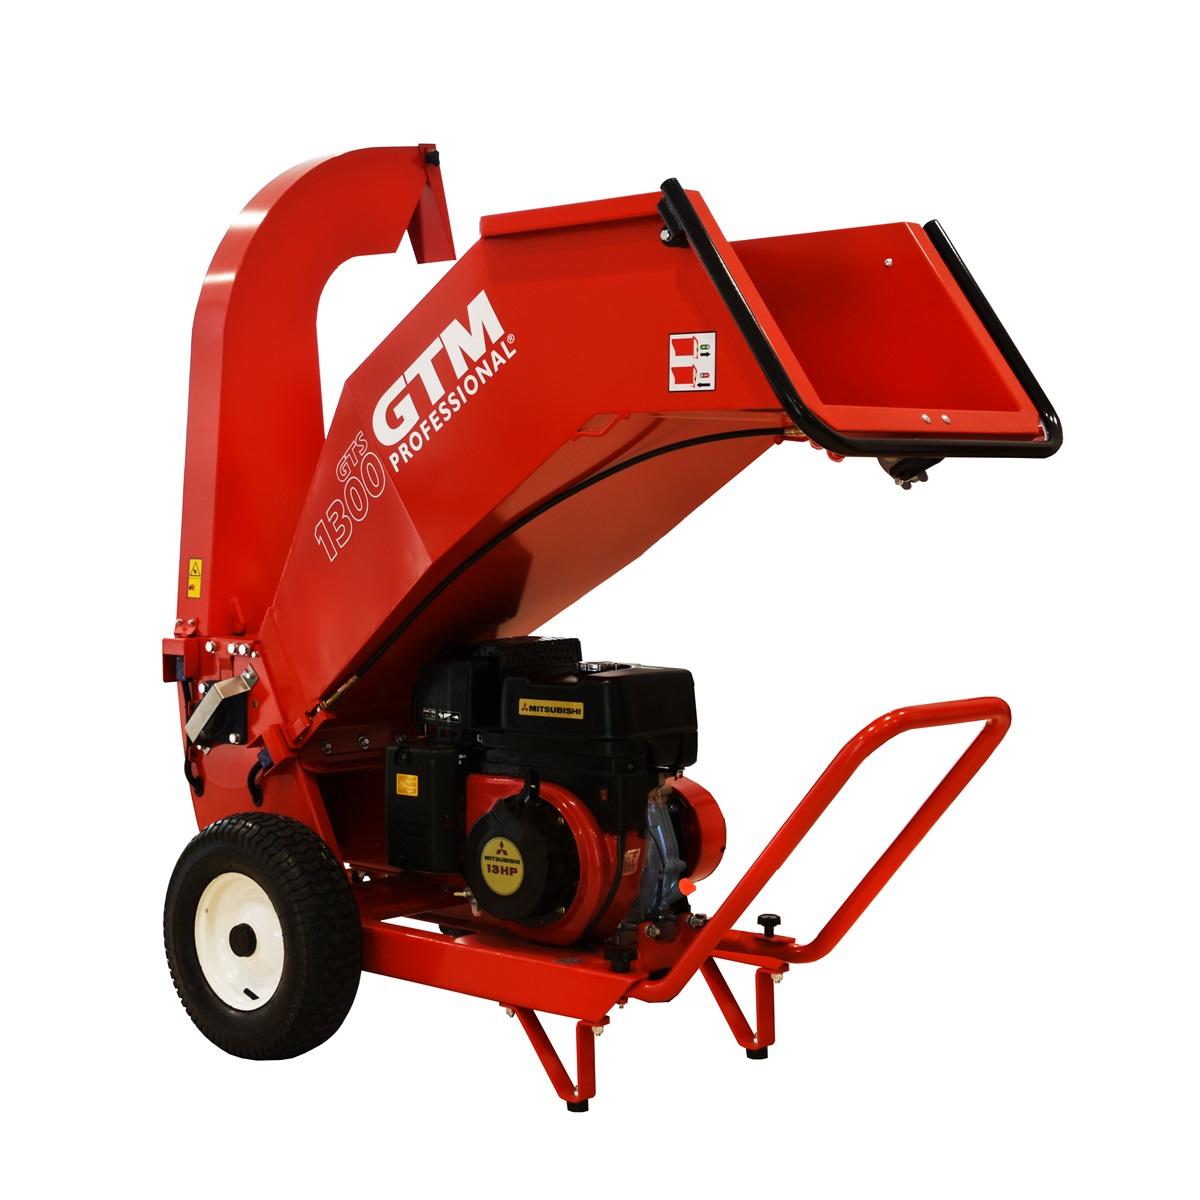 GTM GTS 1300M